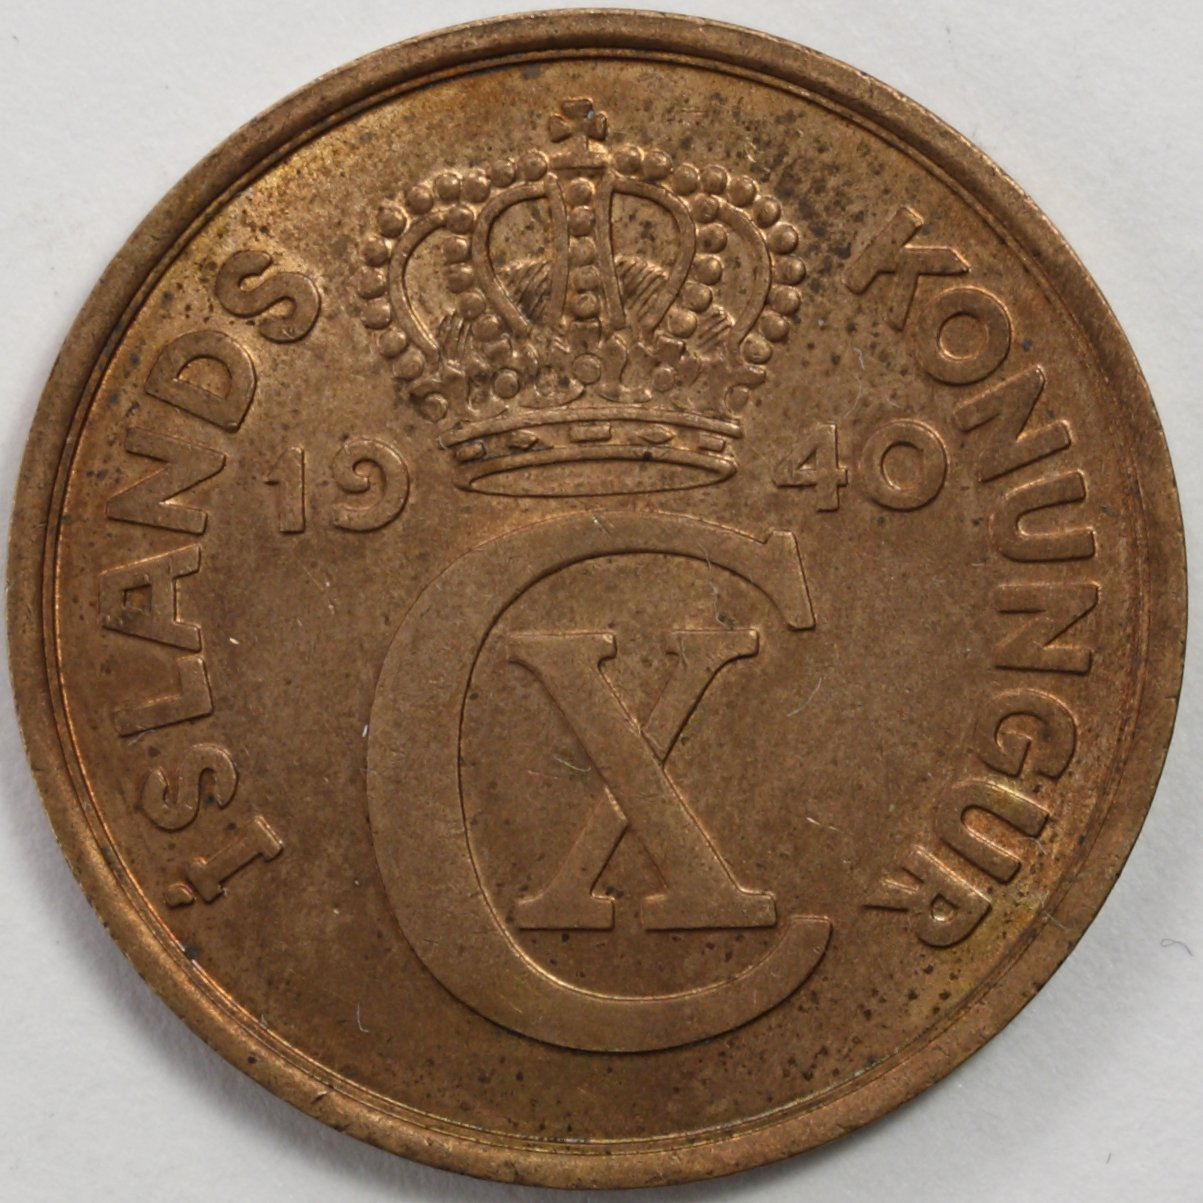 1940 Iceland 5 Aurar Coin